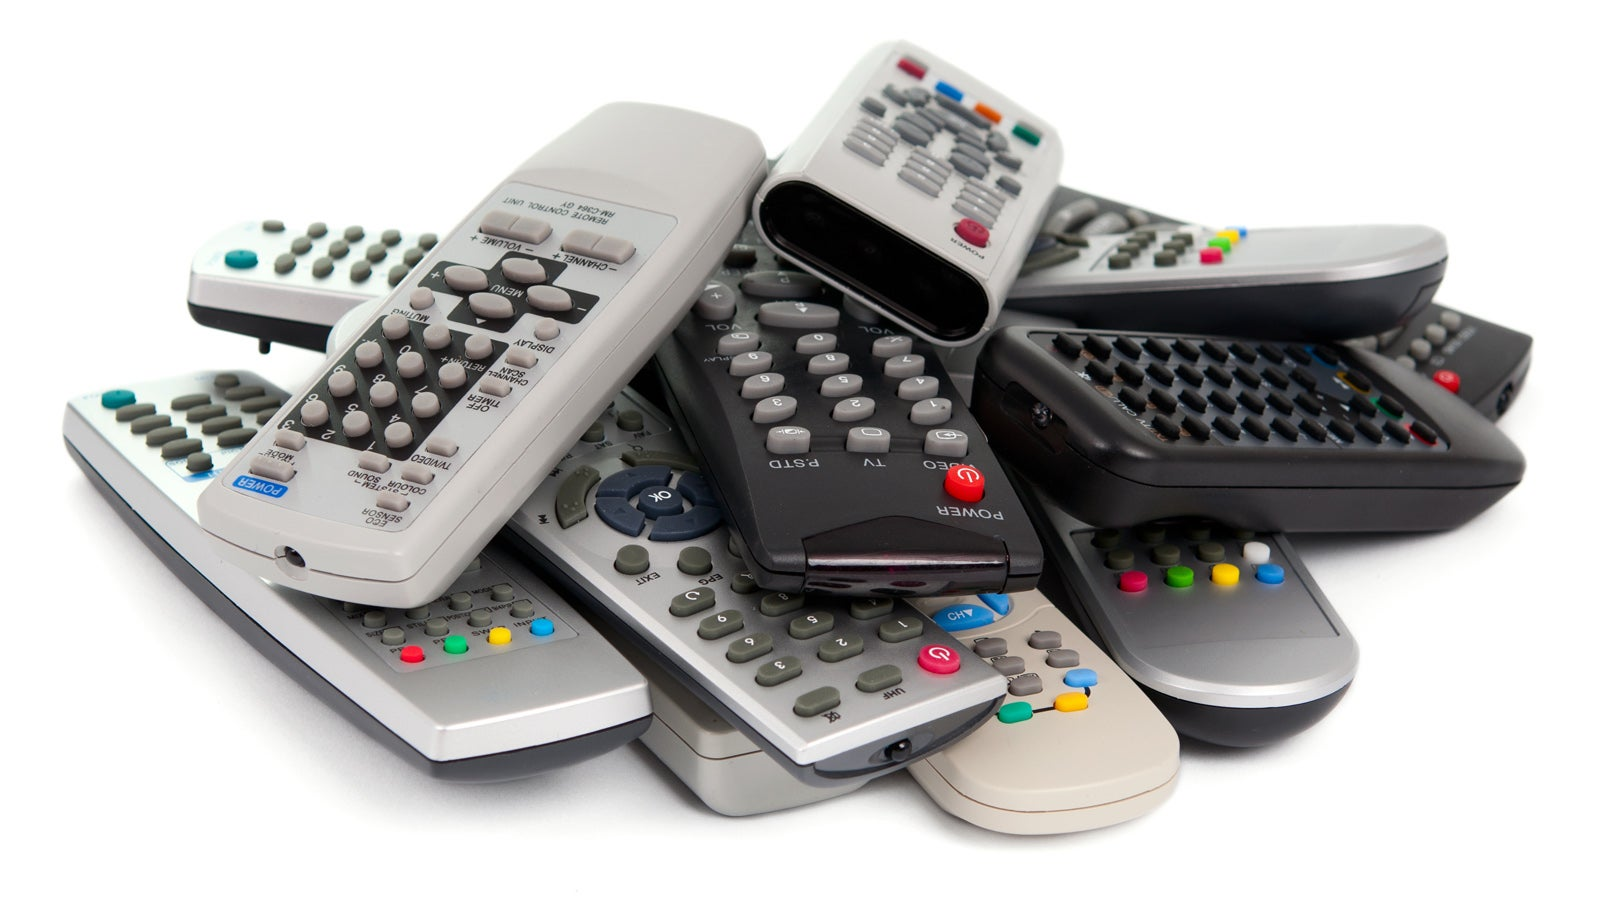 Universal phone remote